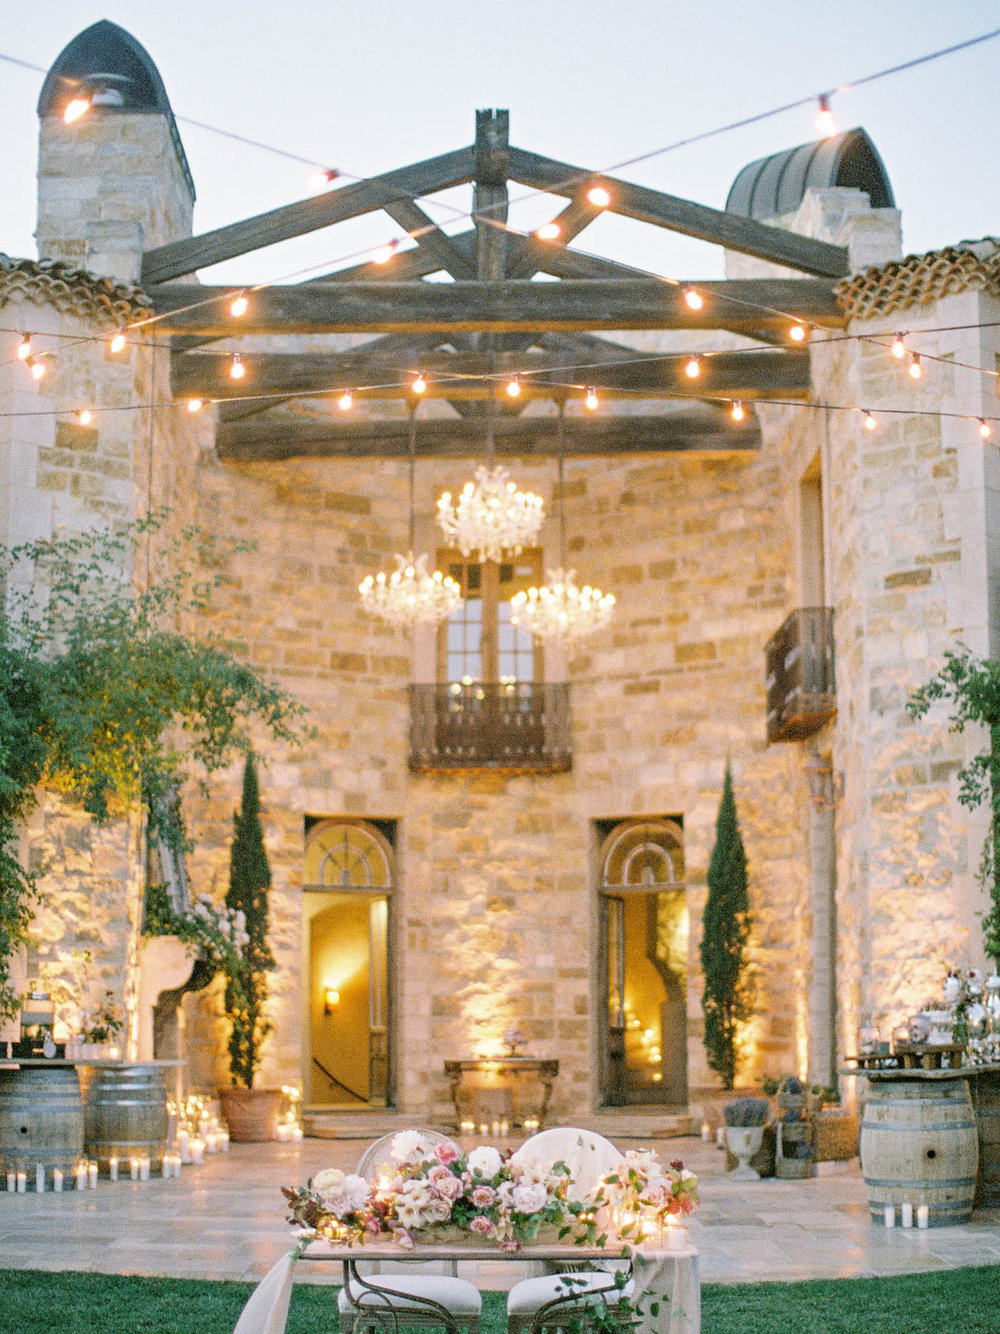 sunstone-villa-wedding-100-Jen_Huang-RD-185-Jen_Huang-009573-R1-009.jpg